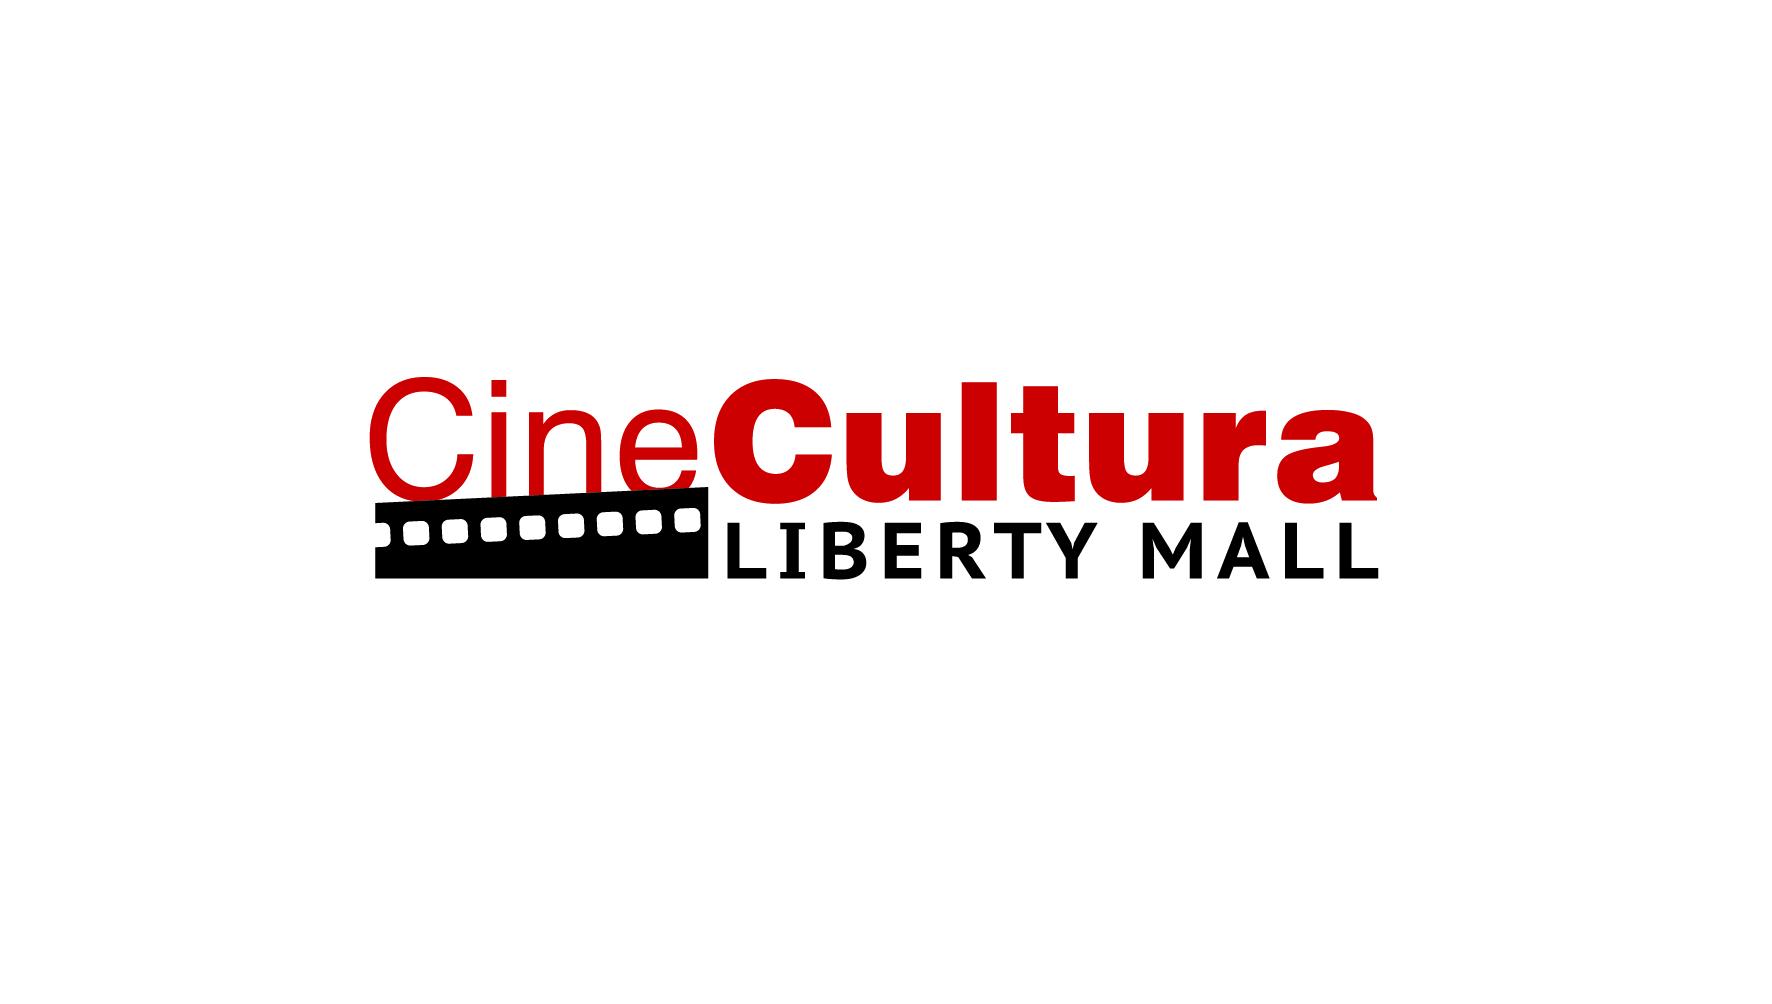 CineCultura Liberty Mall